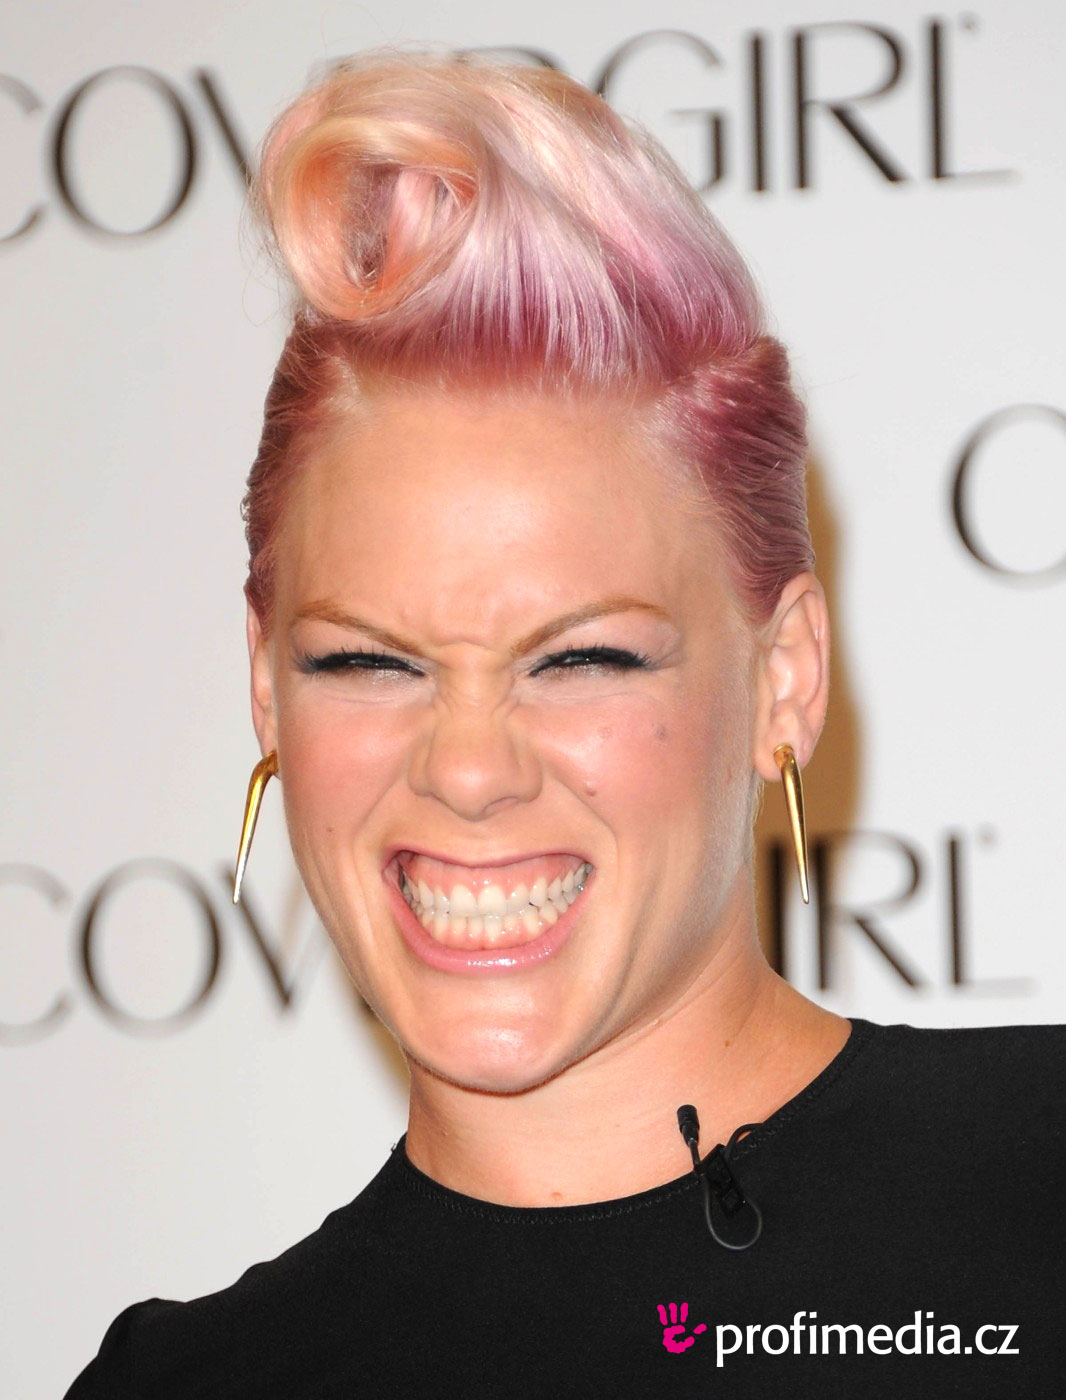 Tremendous Pink Hairstyle Easyhairstyler Short Hairstyles Gunalazisus